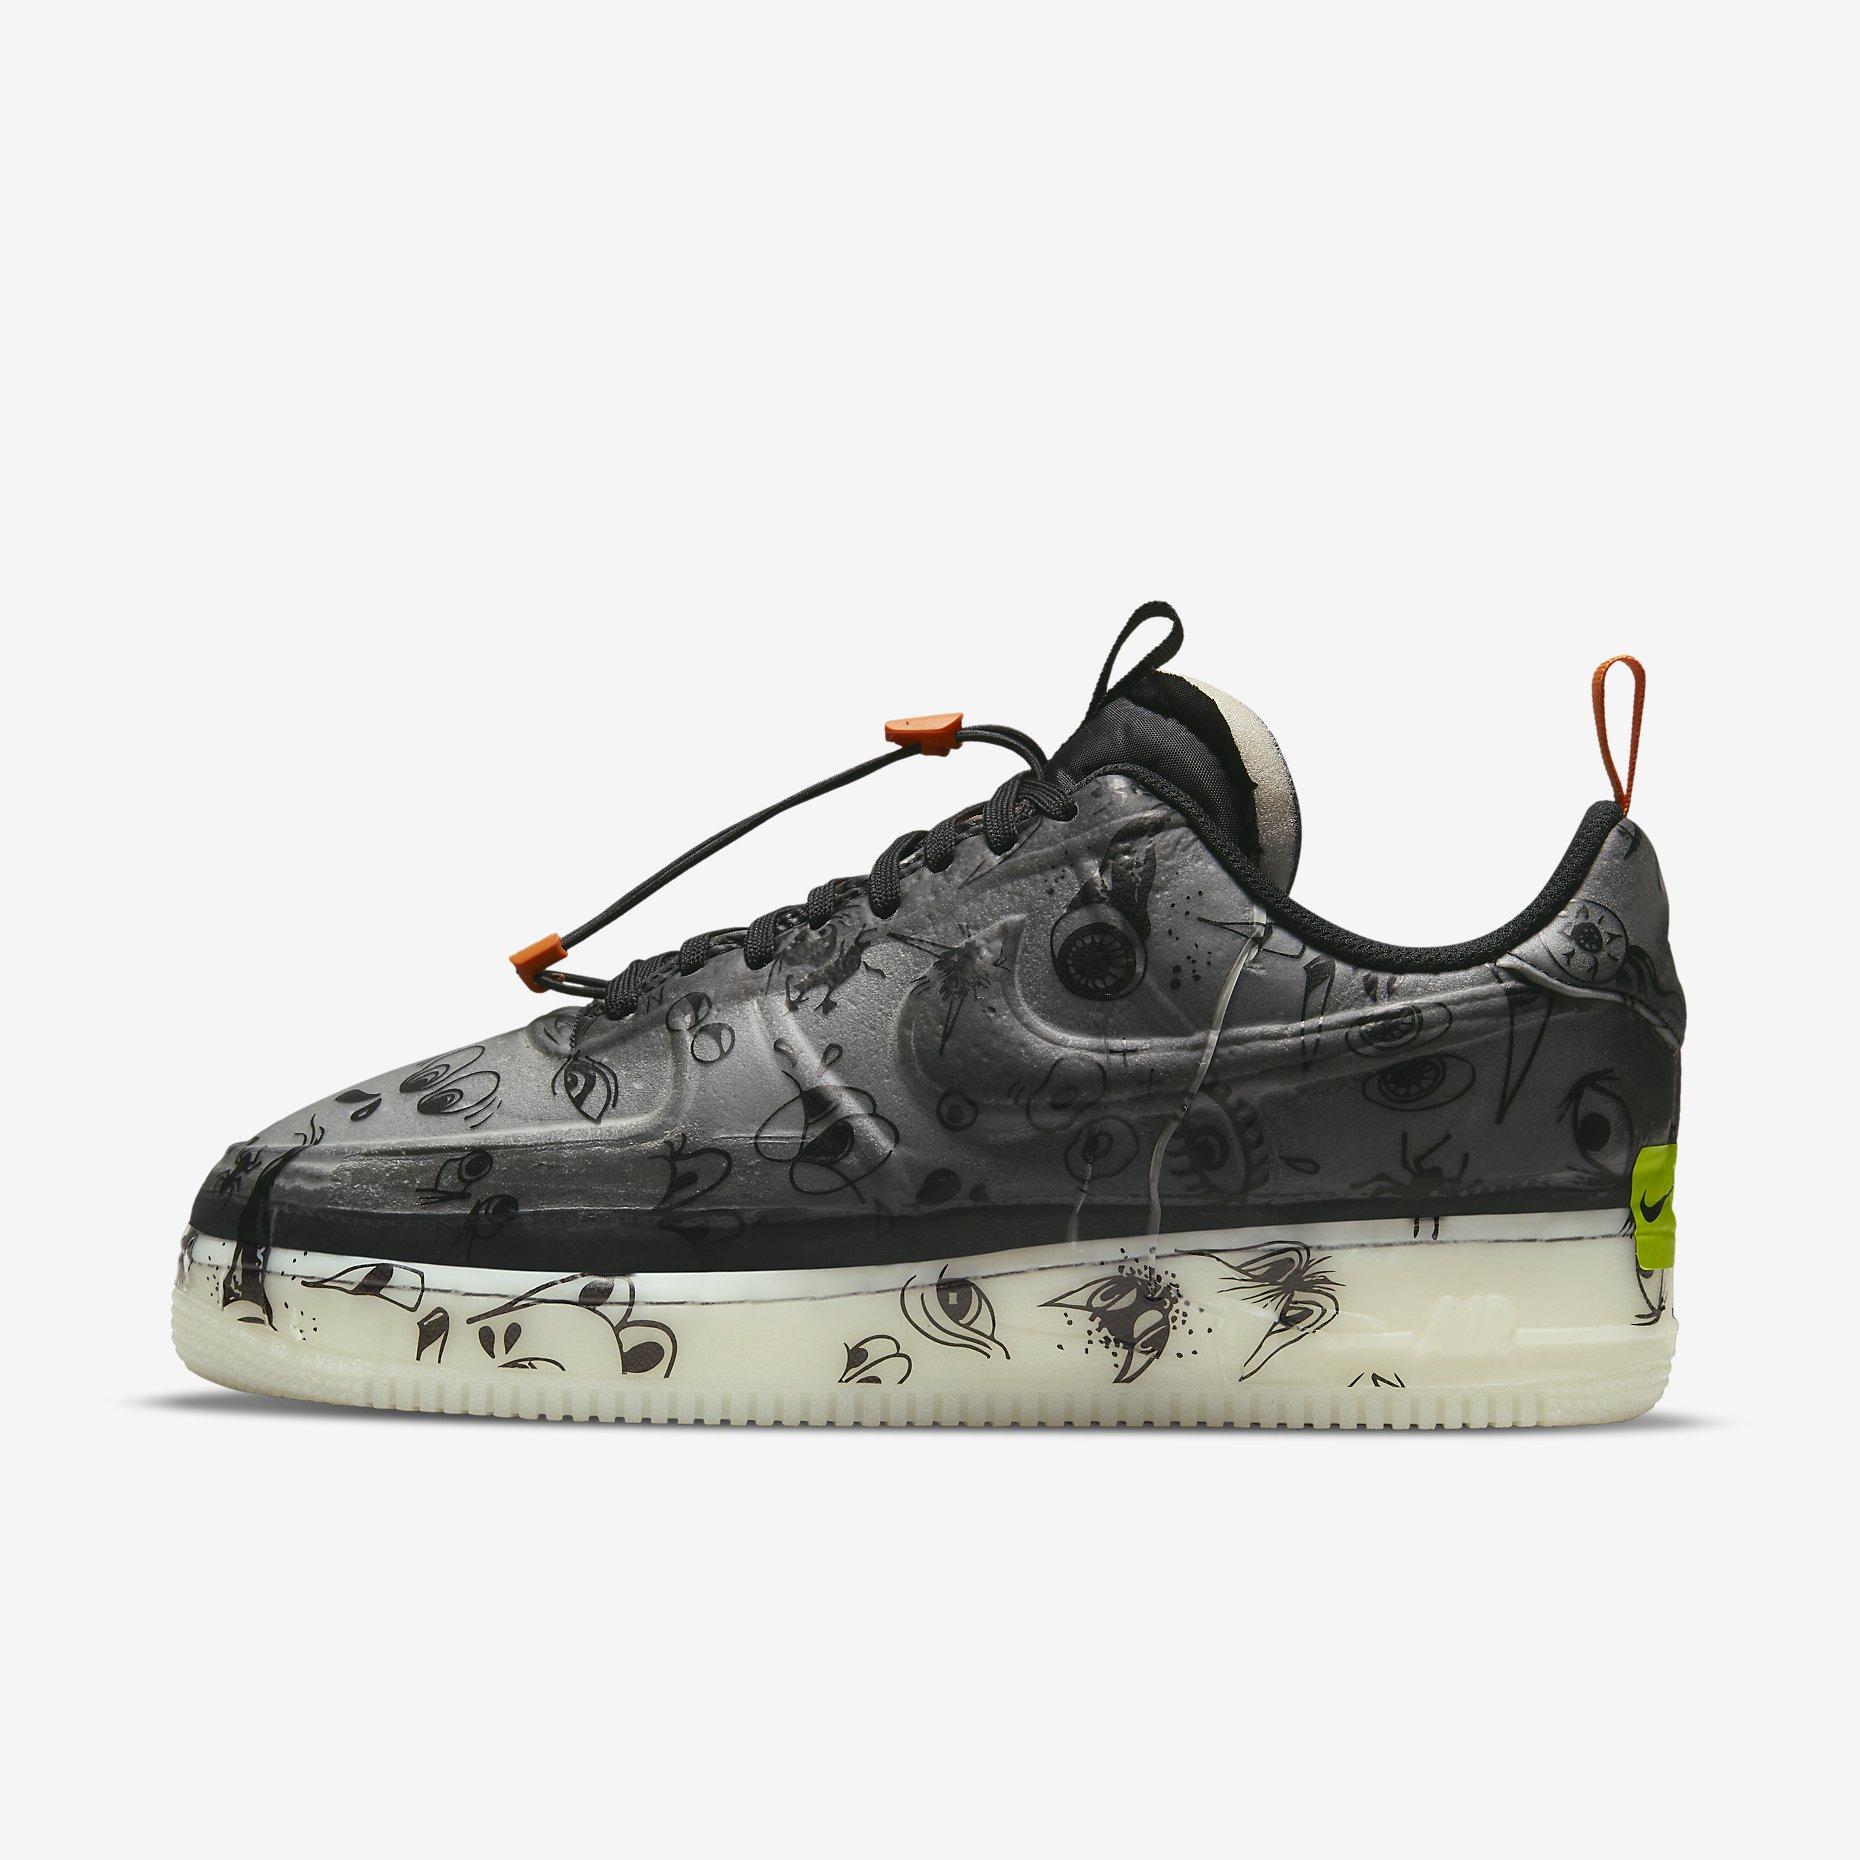 Nike Air Force 1 Experimental 'Halloween'